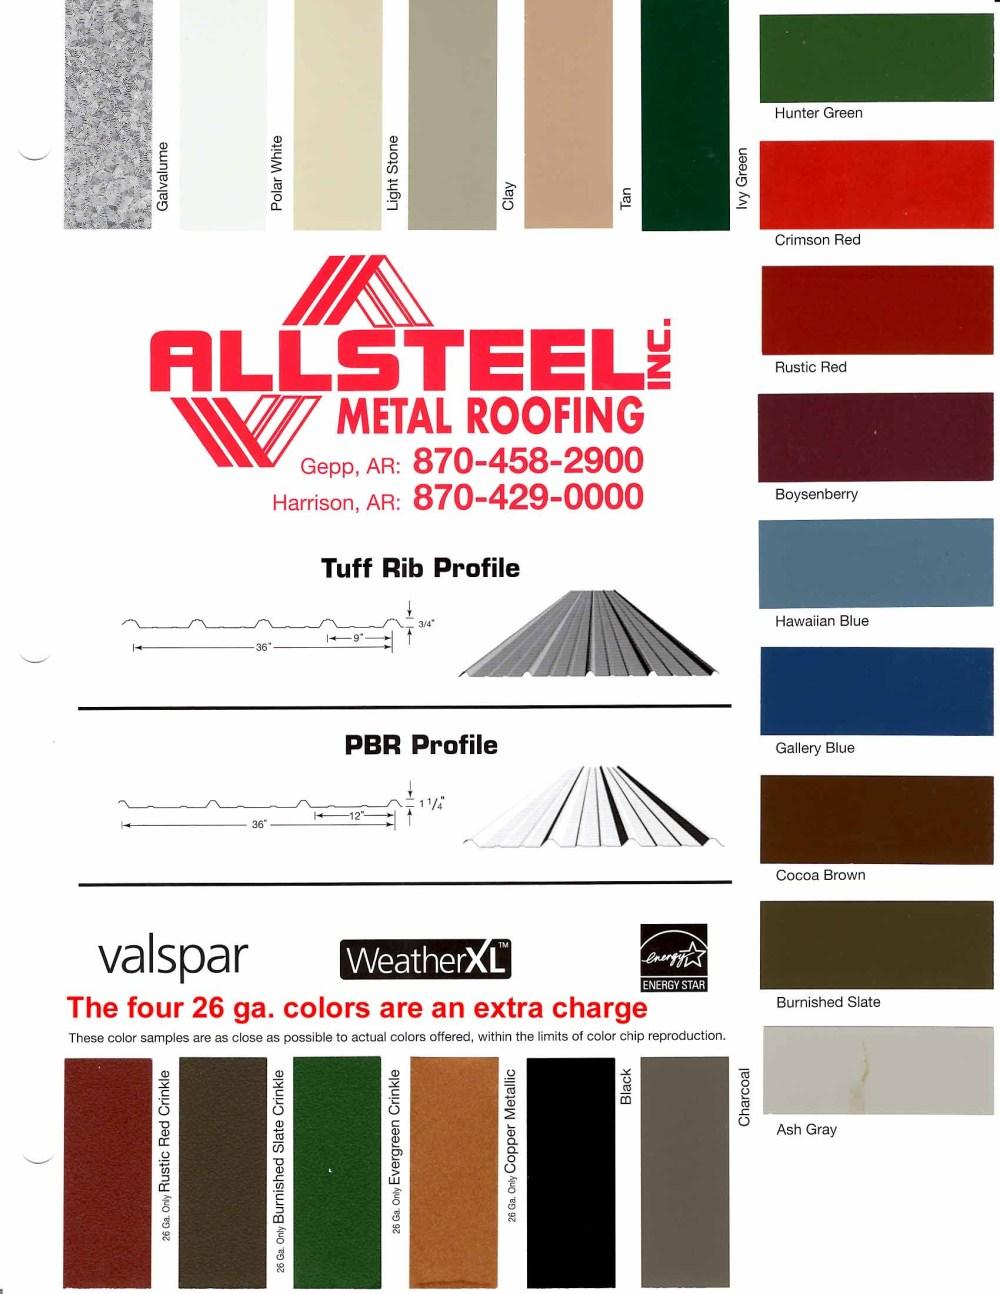 medium resolution of outdoor wood burning furnace colors